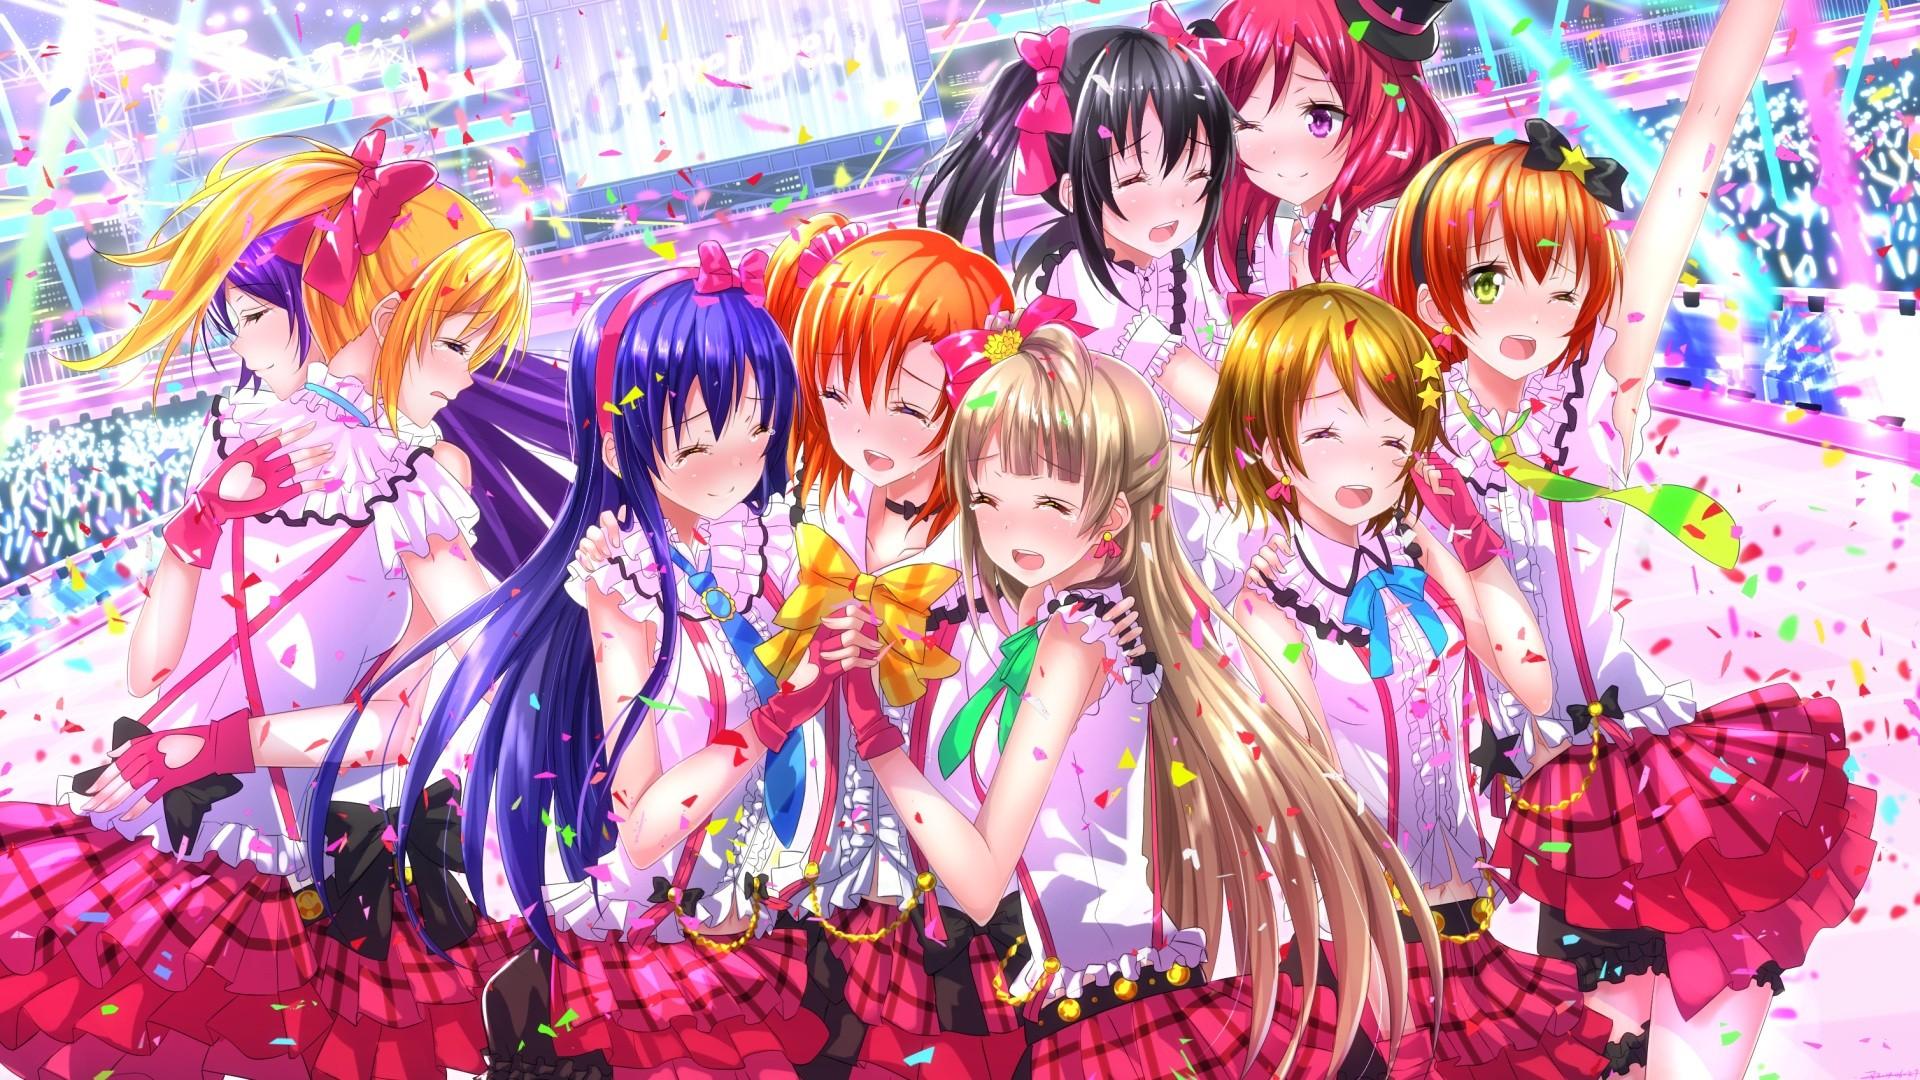 Illustration Anime Girls Love Live Yazawa Nico Nishikino Maki Minami Kotori Koizumi Hanayo Sonoda Umi